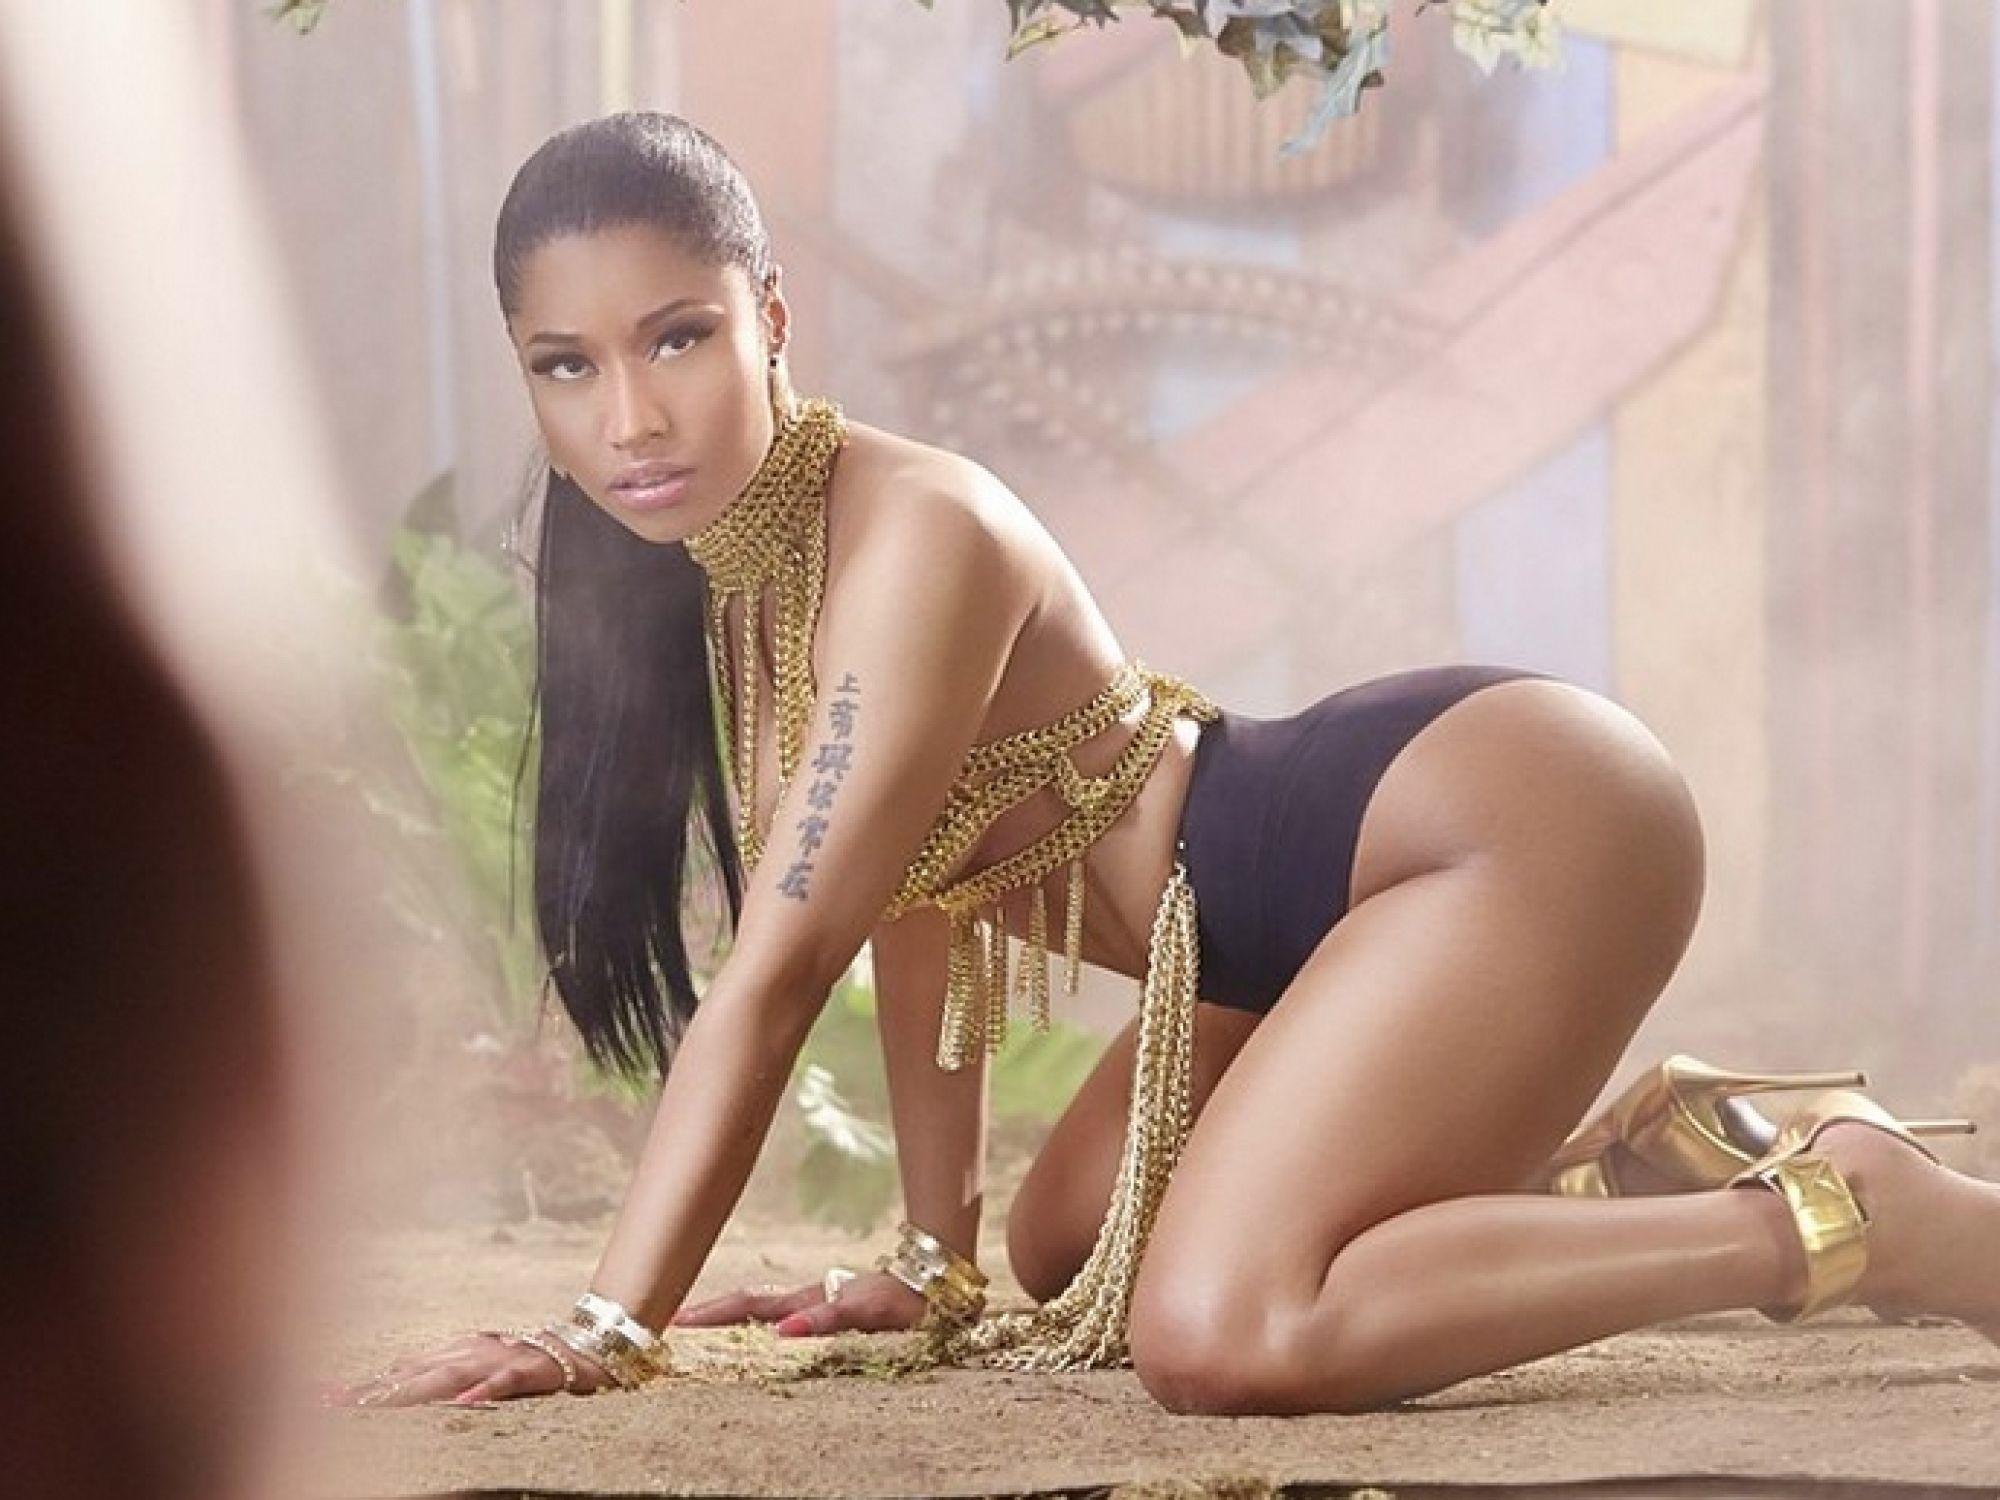 Hot Nicki Minaj nudes (41 photo), Topless, Bikini, Selfie, cameltoe 2019